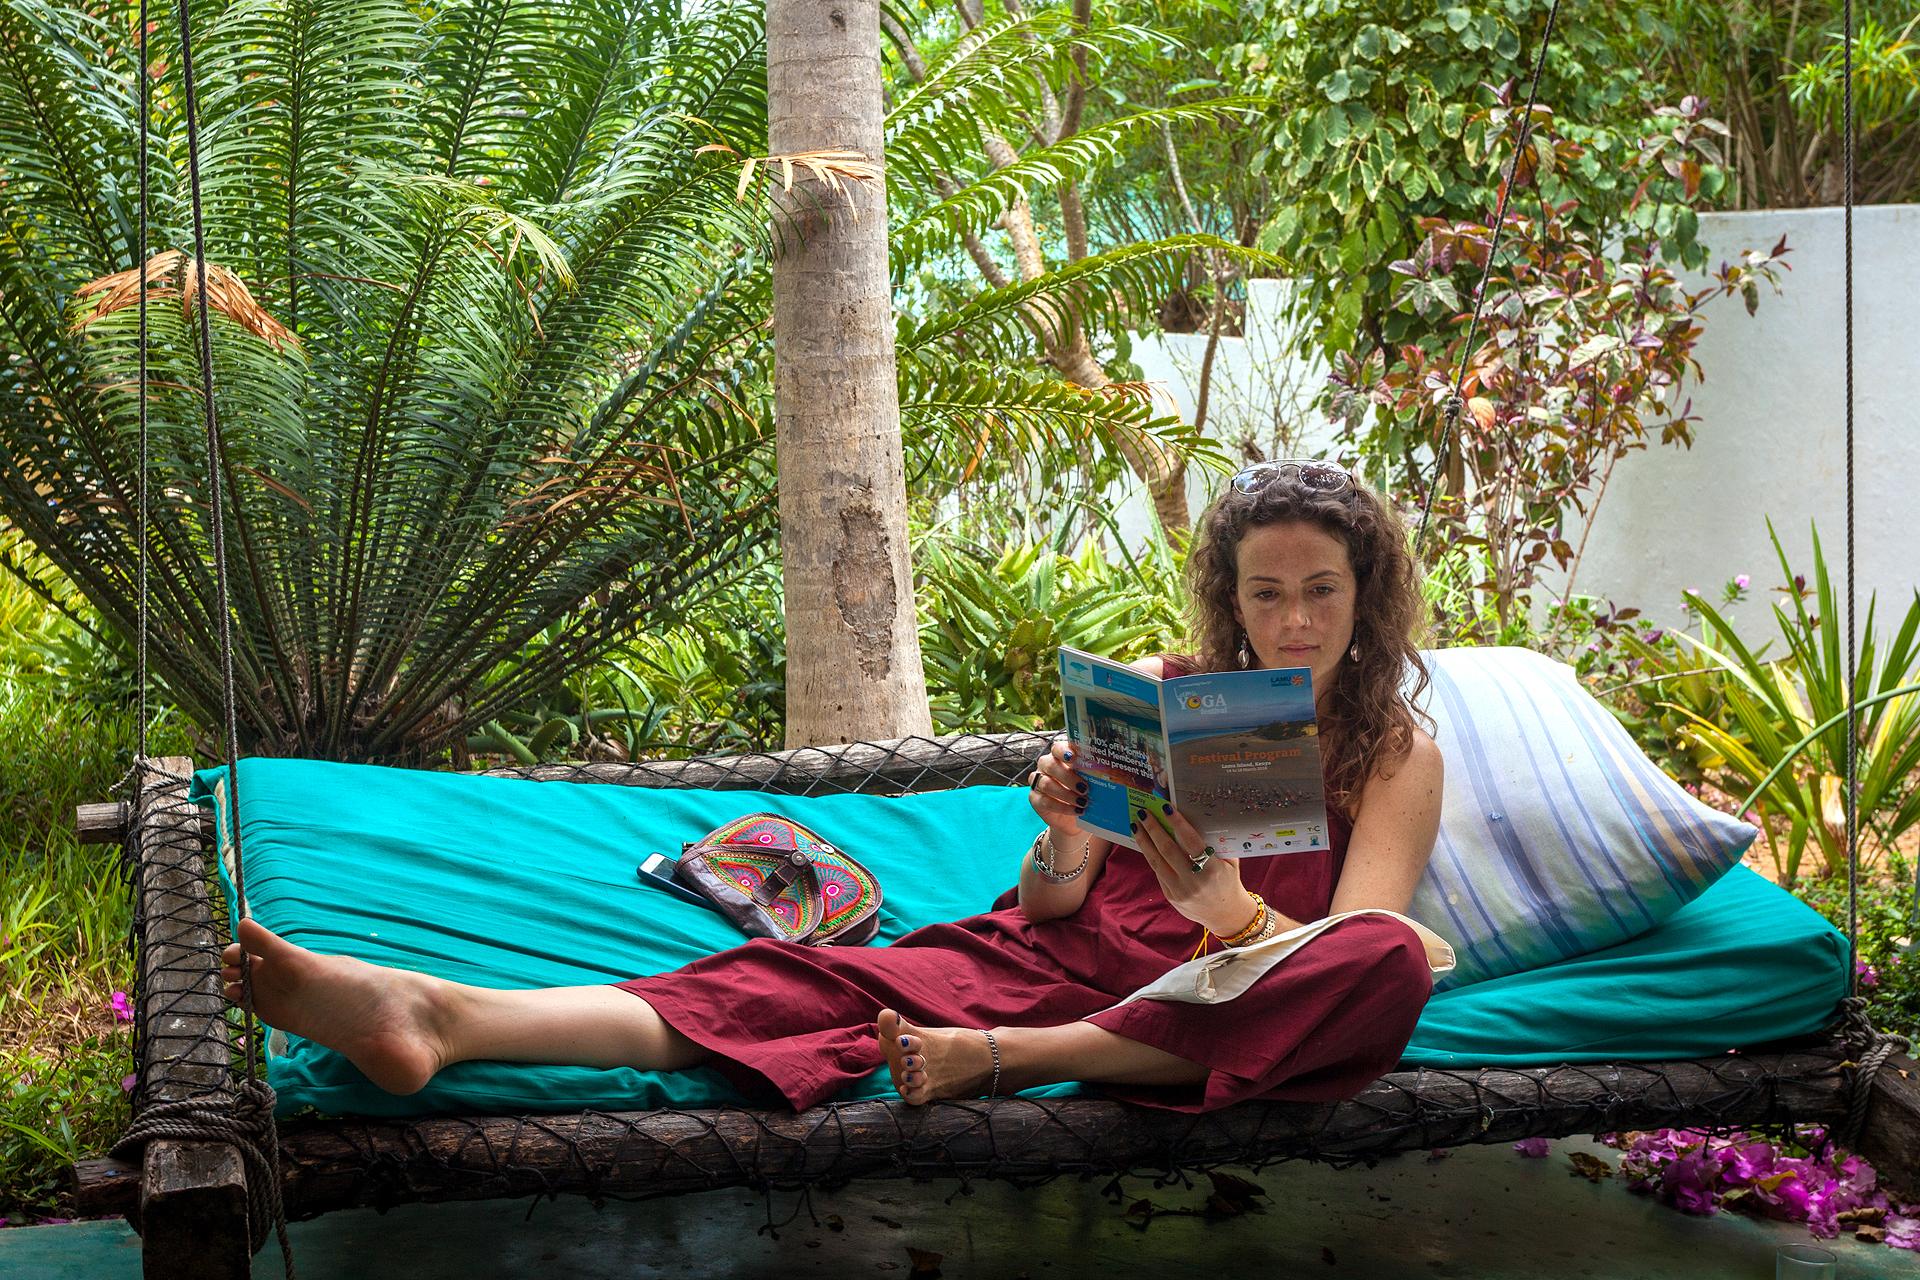 Nina, a travel, nature, yoga and book lover!